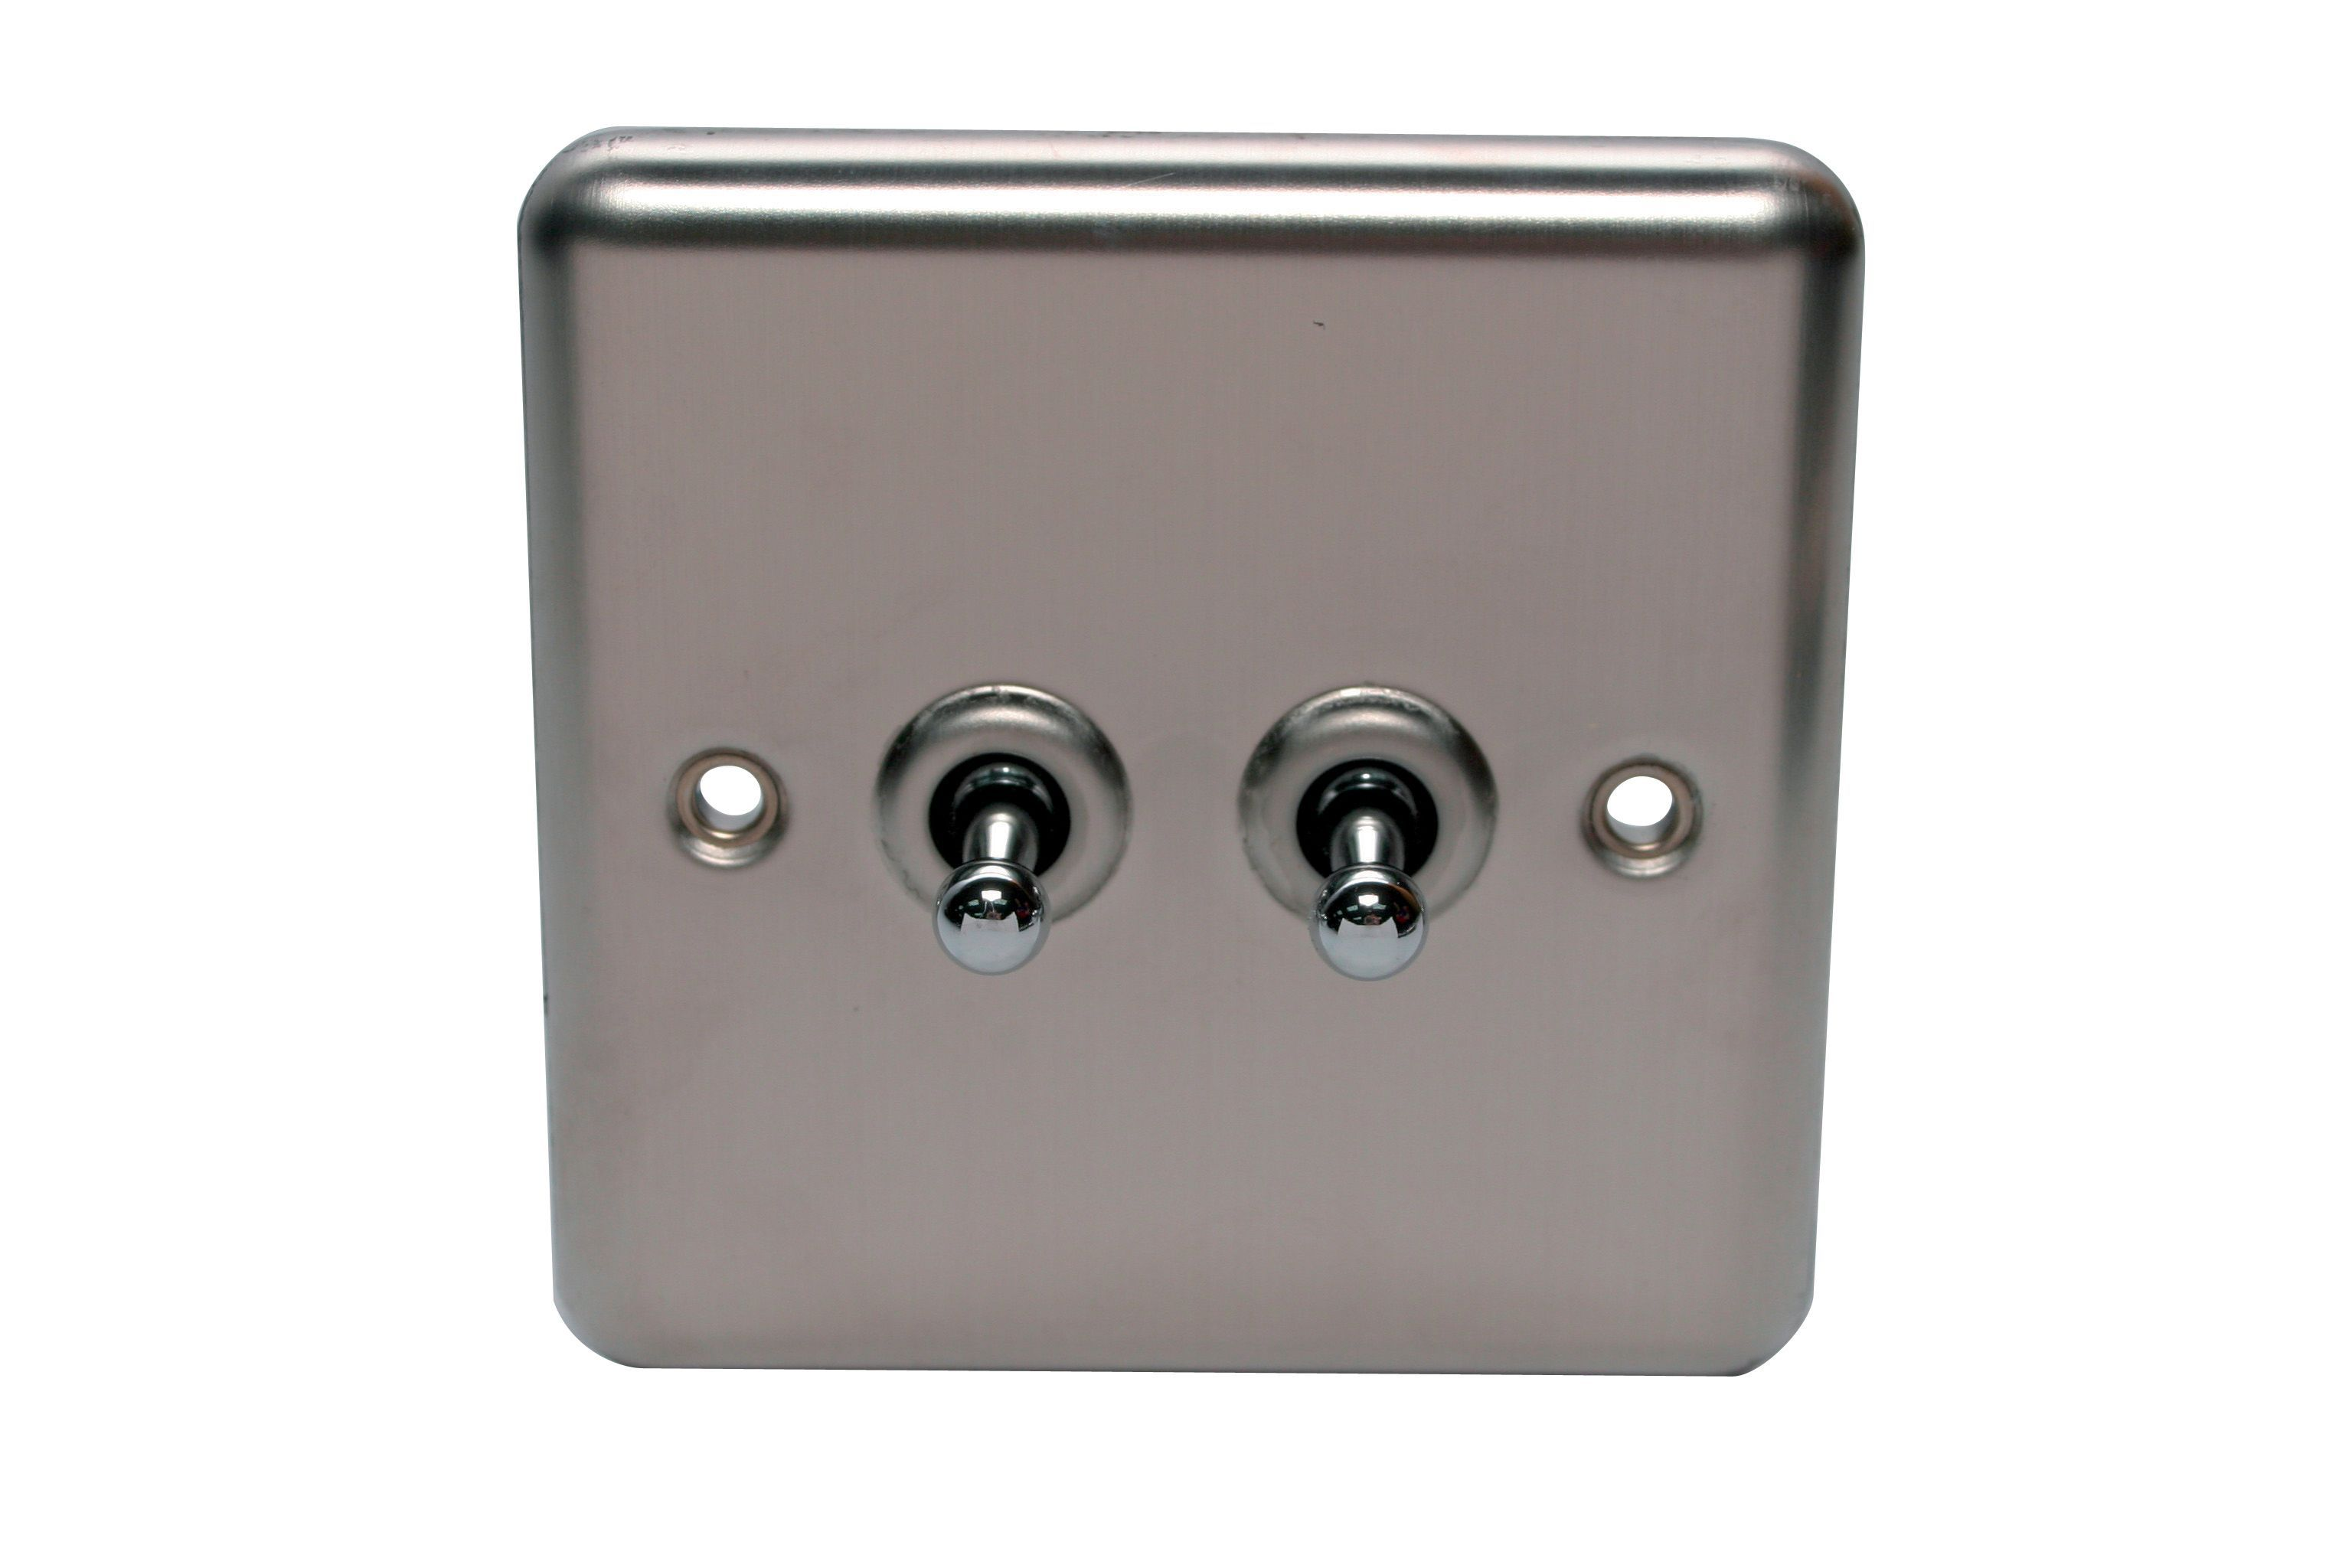 Holder 10a 2-way Single Polished Steel Toggle Switch